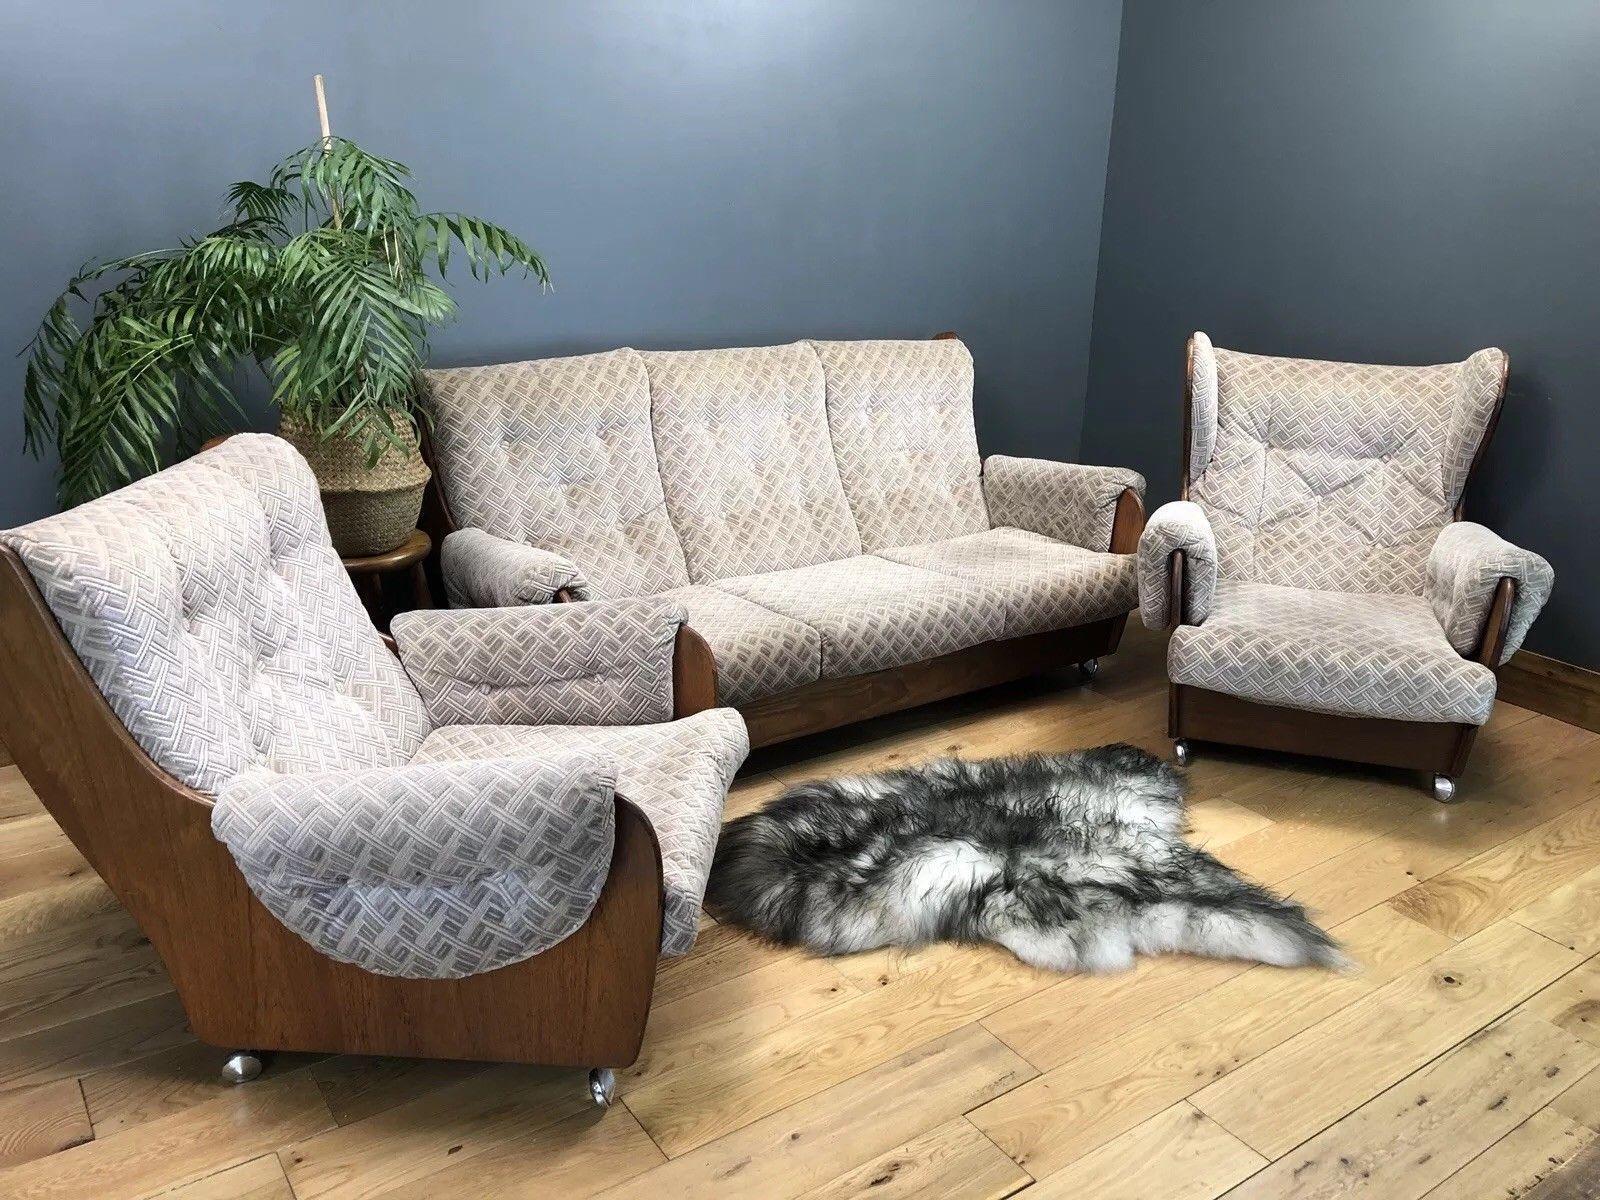 Retro Mid Century Vintage G Plan Armchair Chair Saddleback Teak Sofa Couch Suite G Plan Vinterior